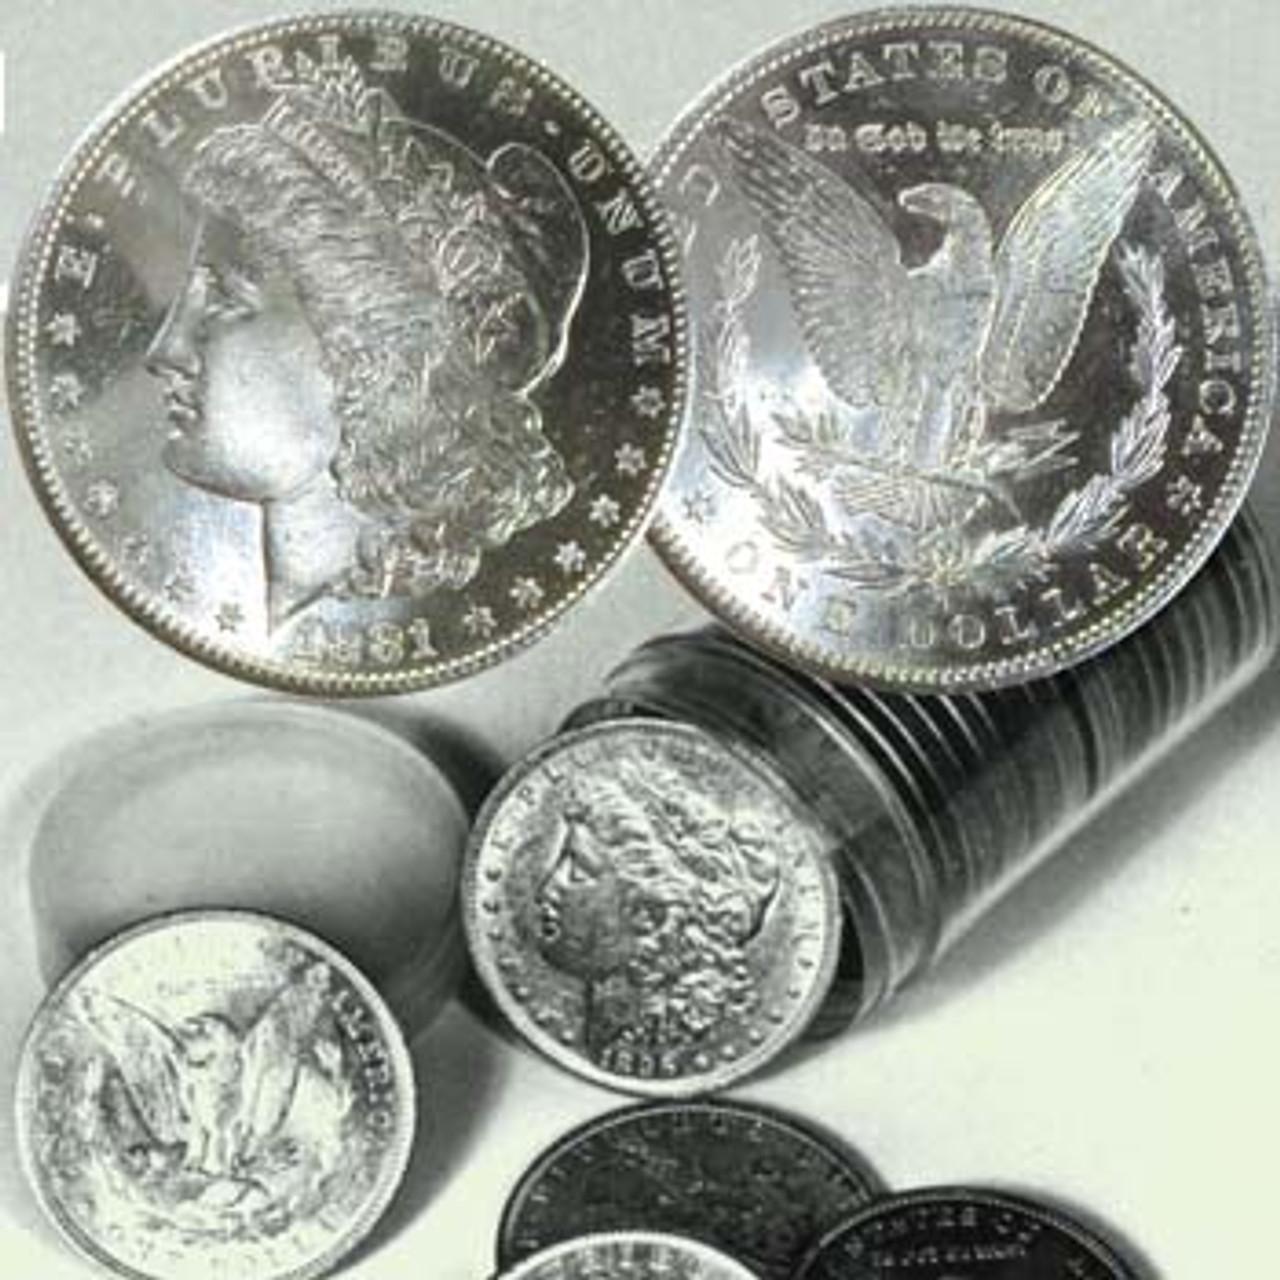 1878-1921 Morgan Silver Dollar Proof-Like Brilliant Uncirculated Image 1